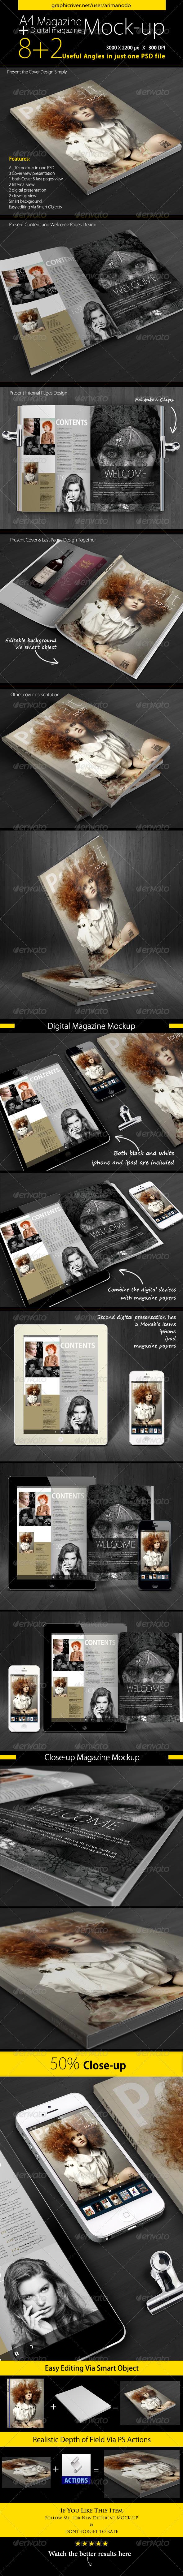 GraphicRiver A4 Magazine & Digital Magazine Mock-up 5007443